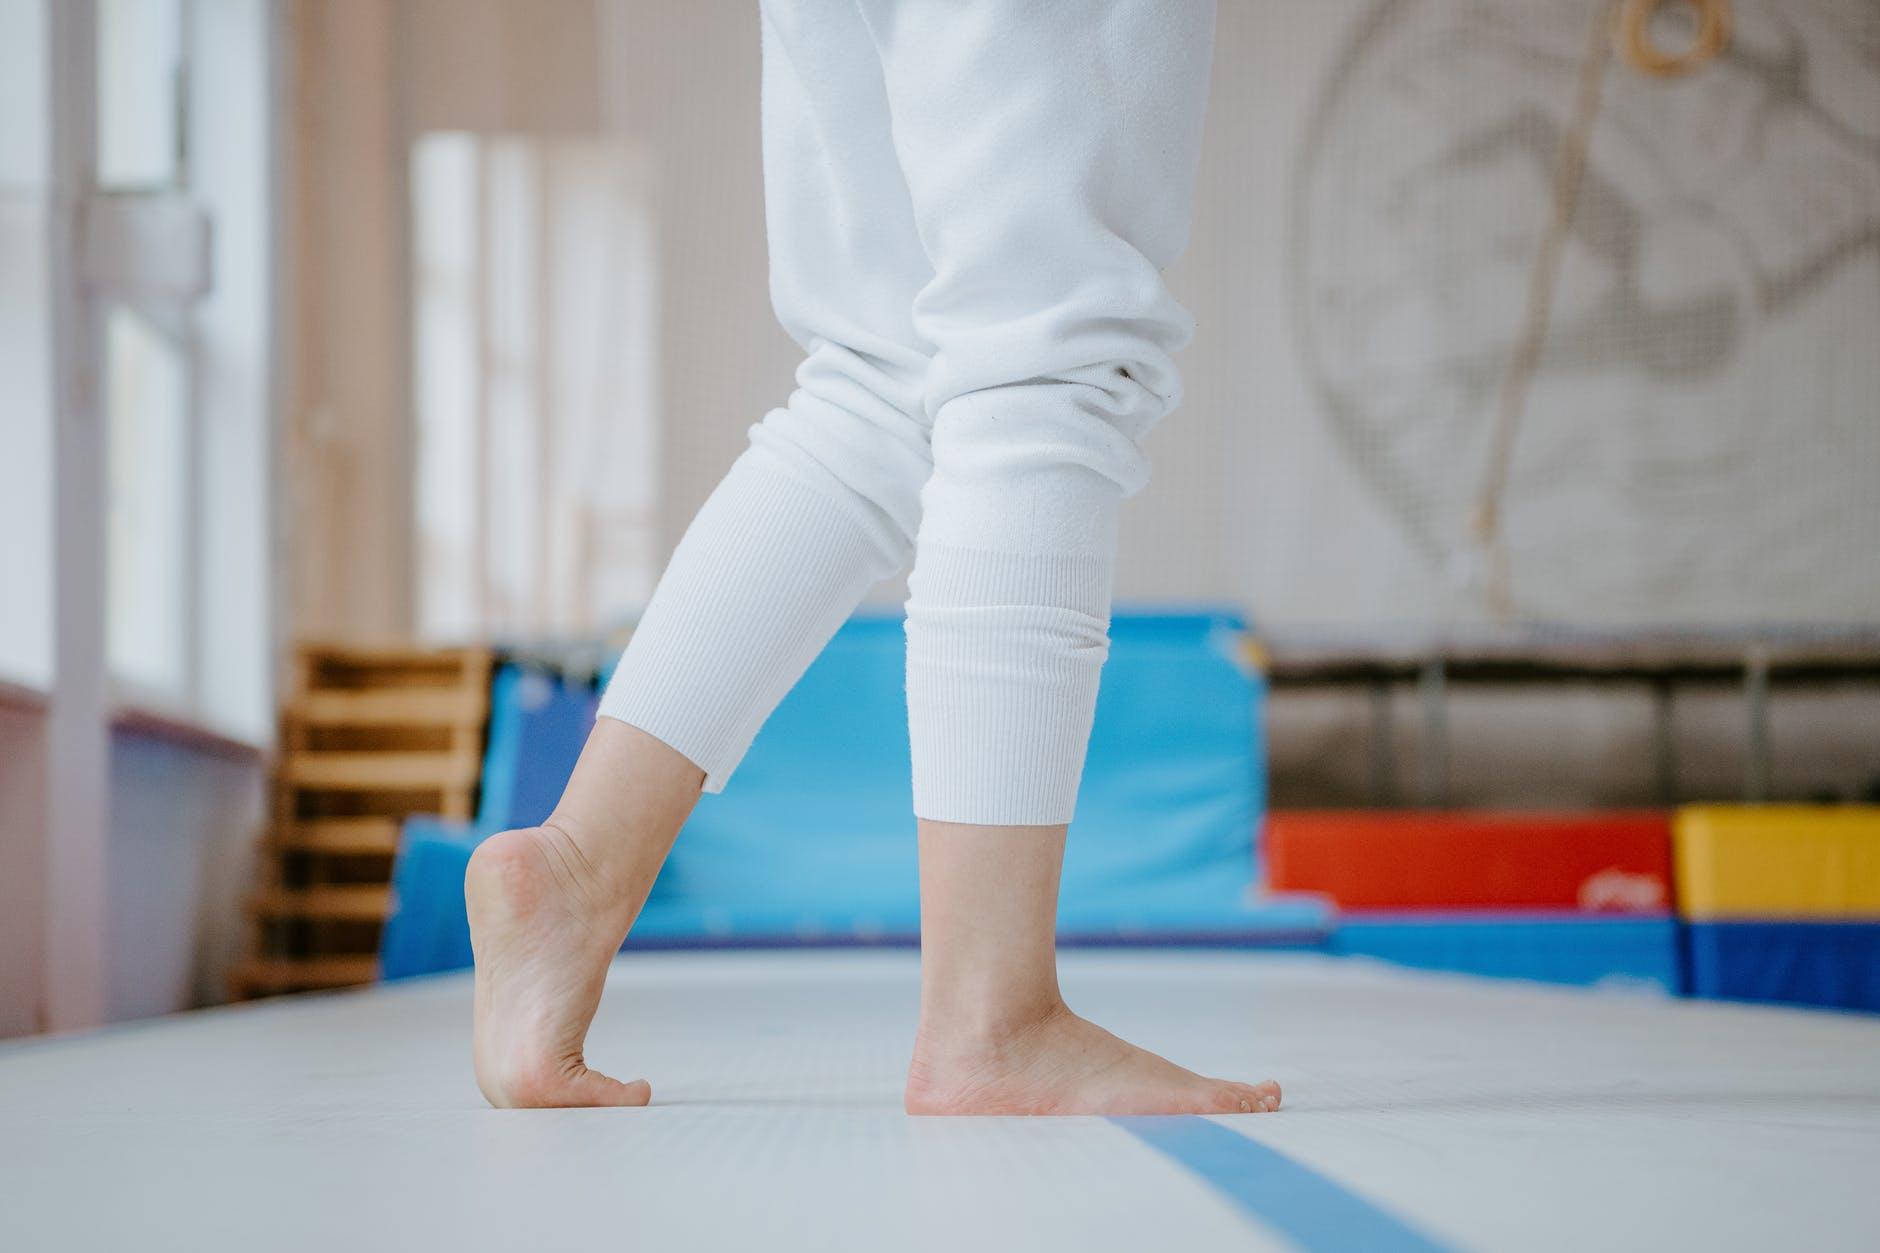 crop female athlete standing on mat in gymnastic studio